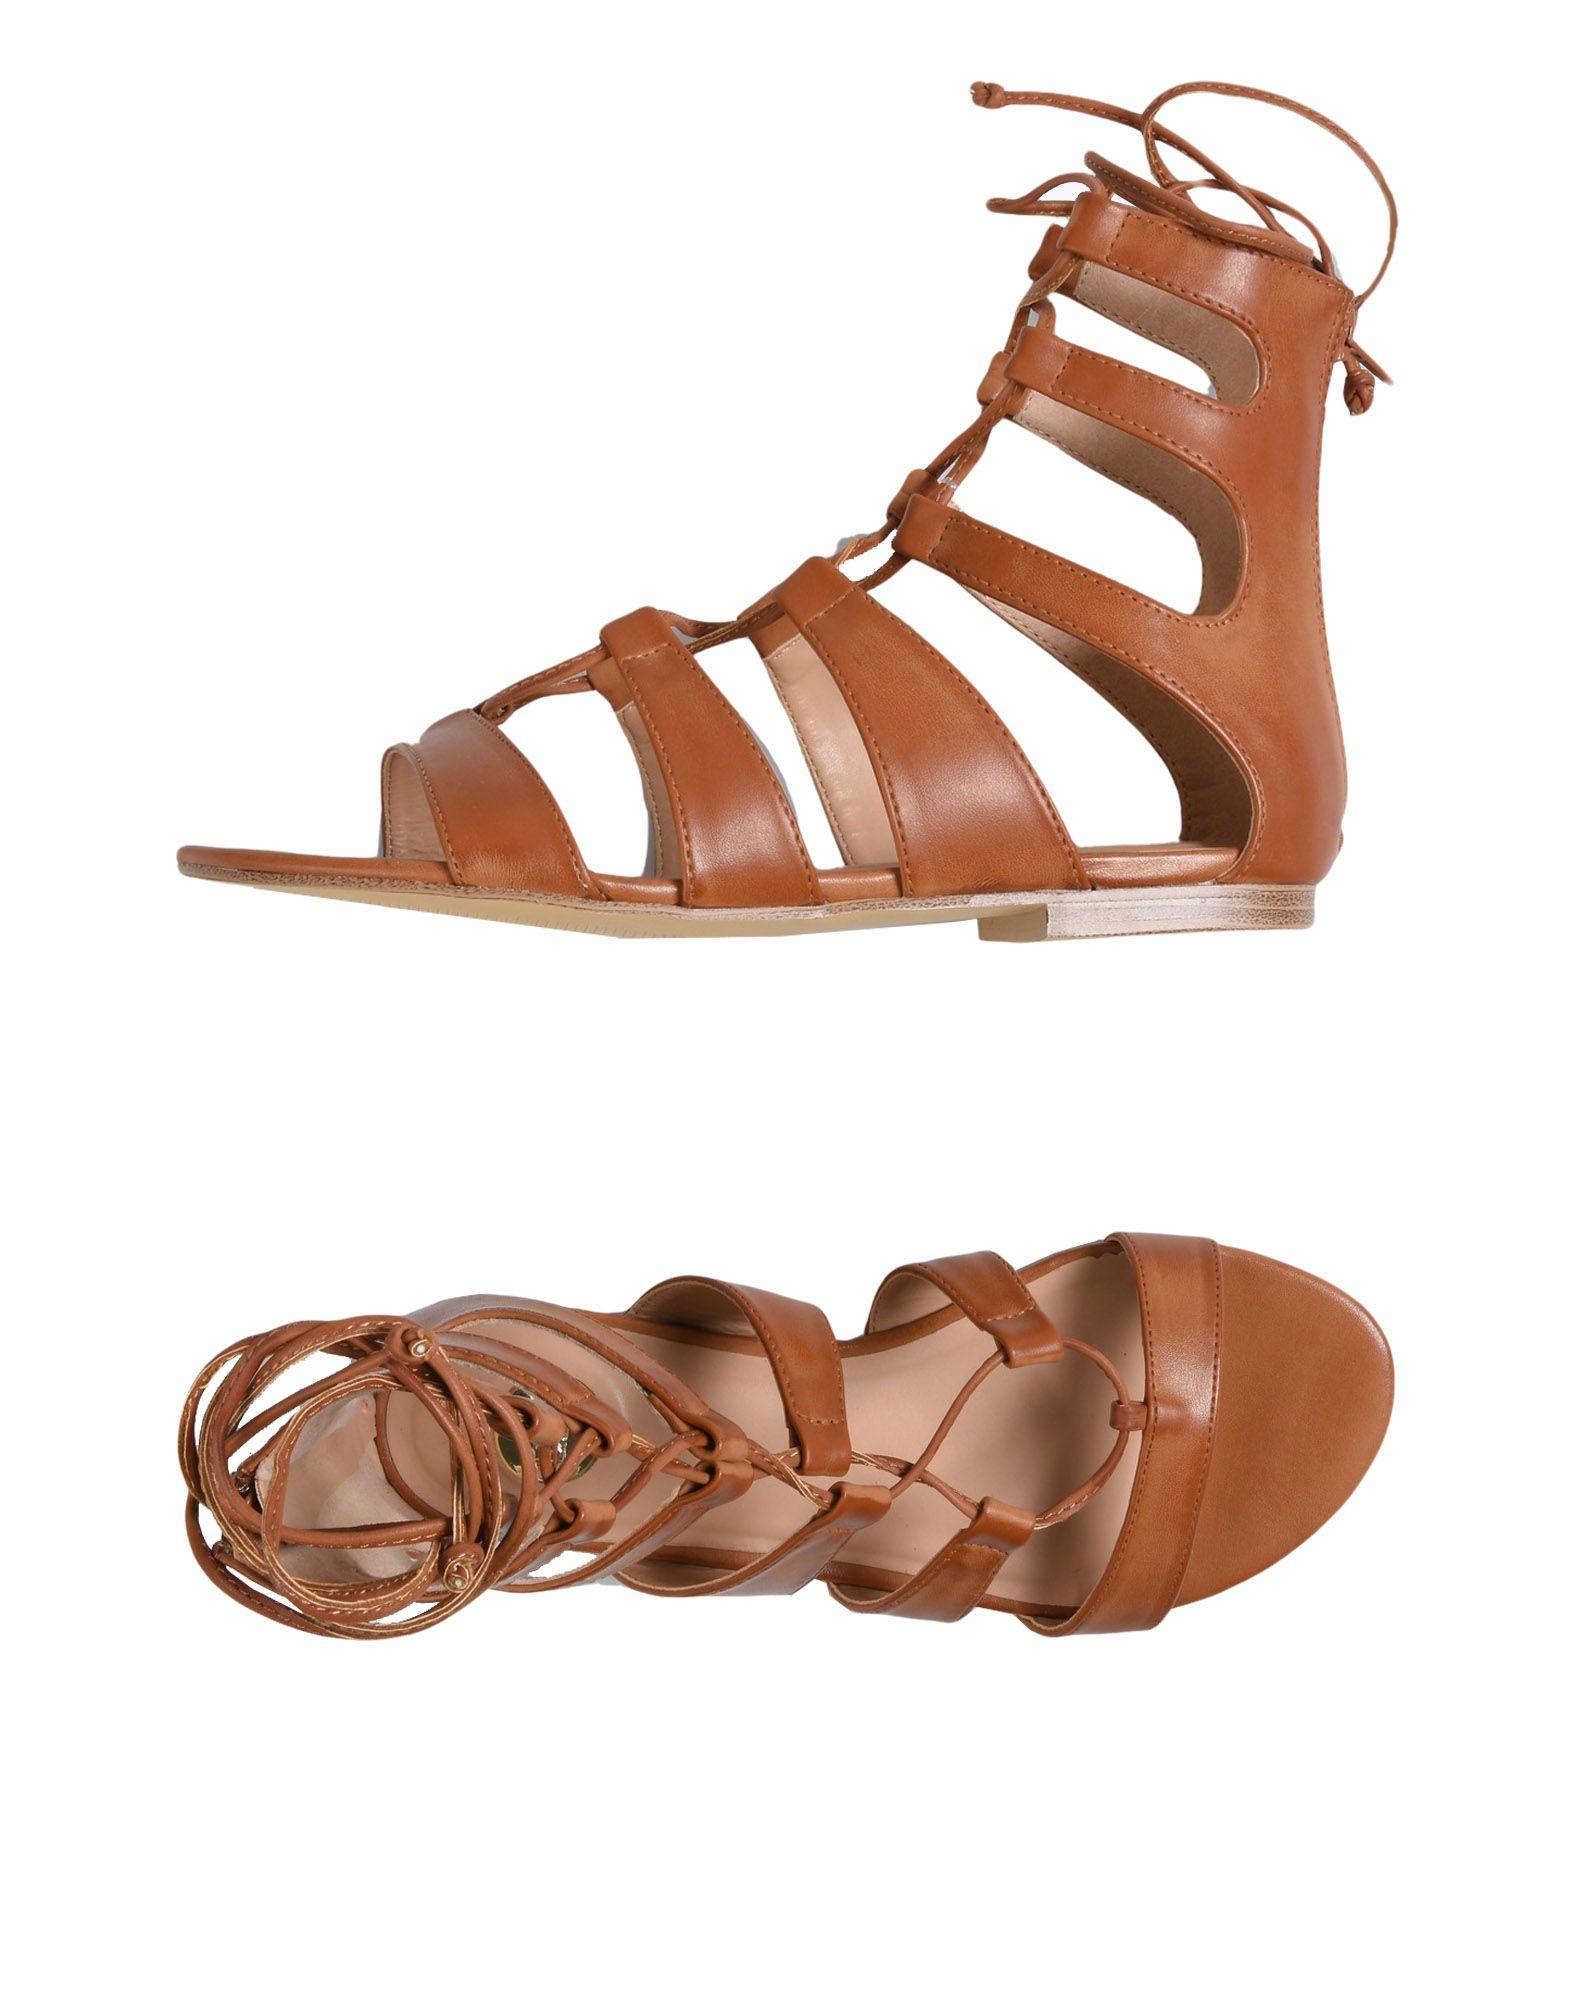 Haltbare Mode billige Schuhe Exe' Sandalen Damen  11387316FS Heiße Schuhe